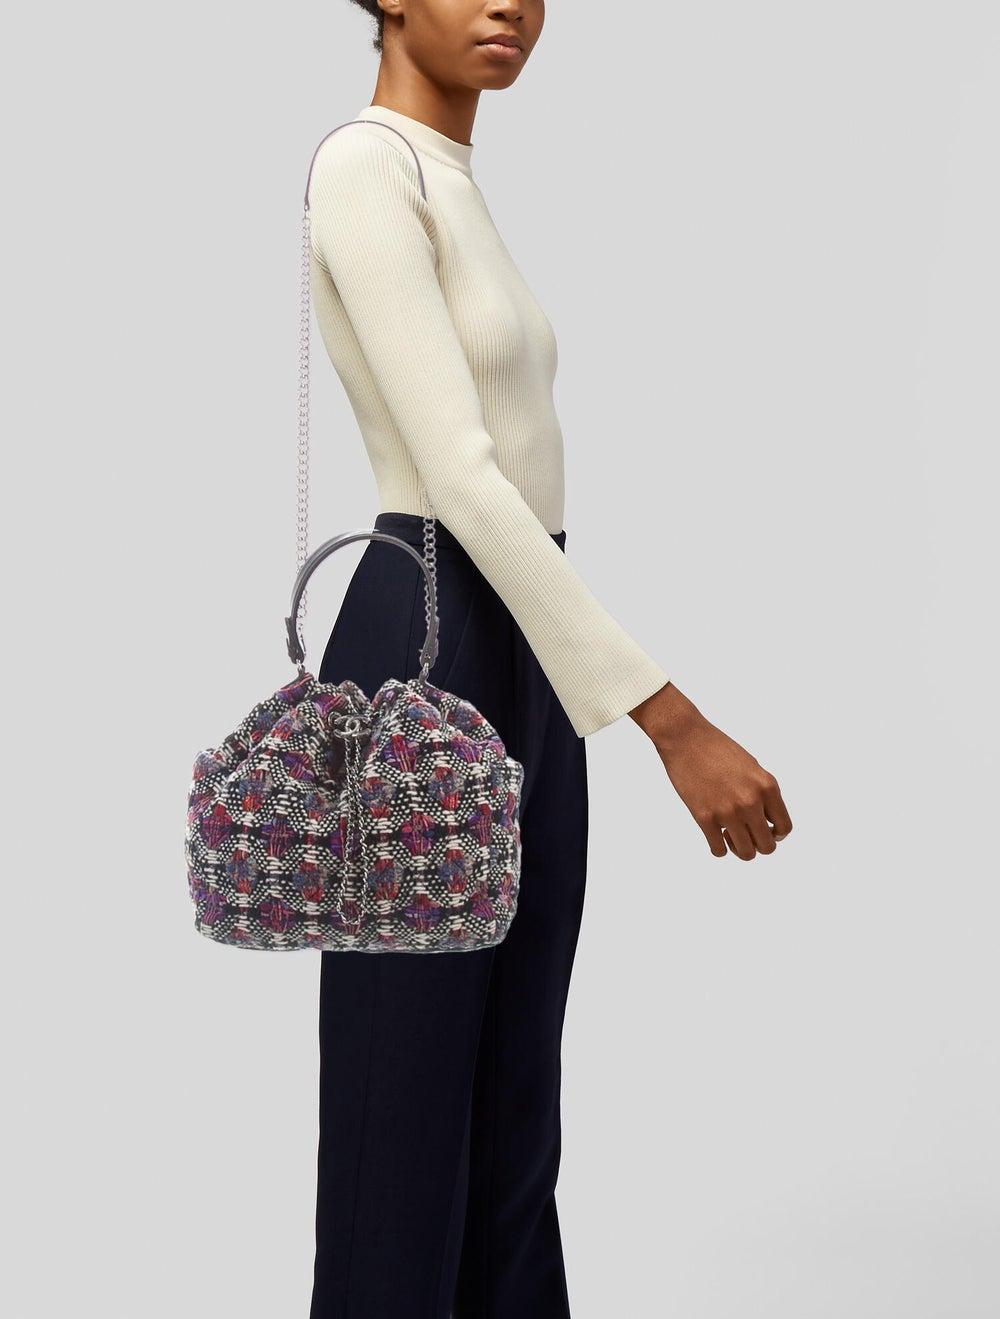 Chanel Tweed Drawstring Bag Cream - image 2